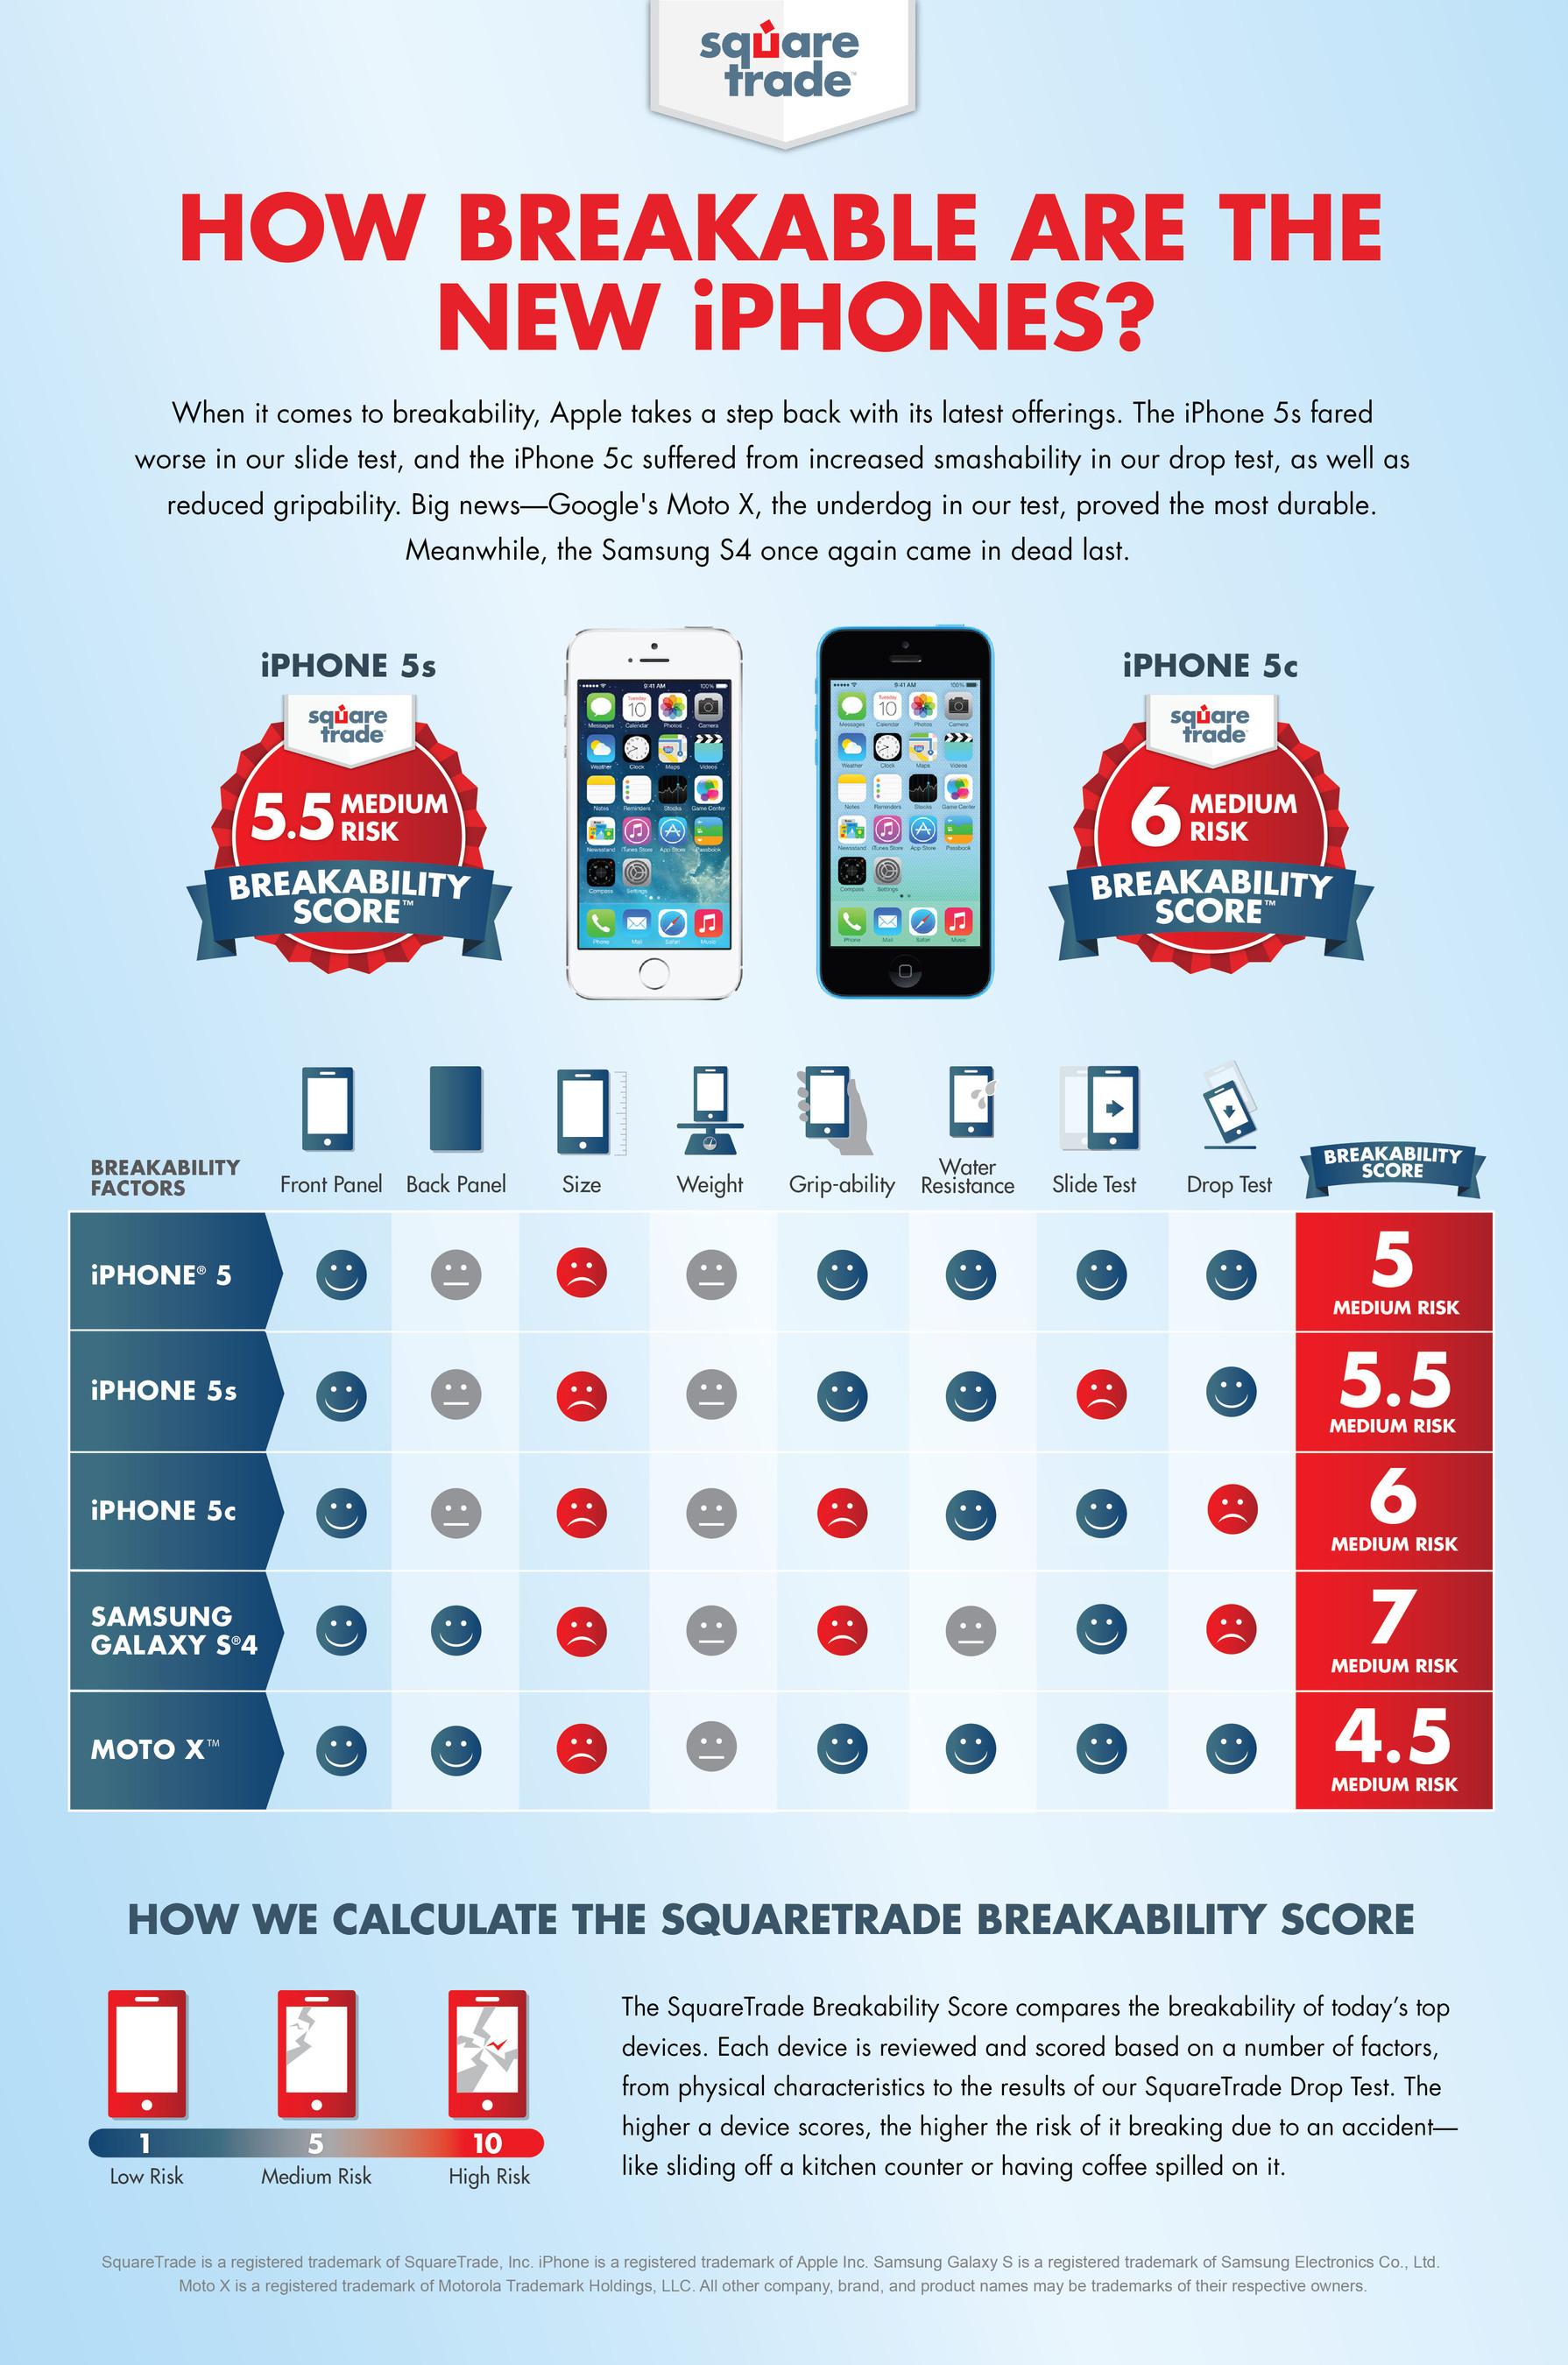 Google's Moto X Trumps Apple's New iPhones in Latest Breakability Score from SquareTrade